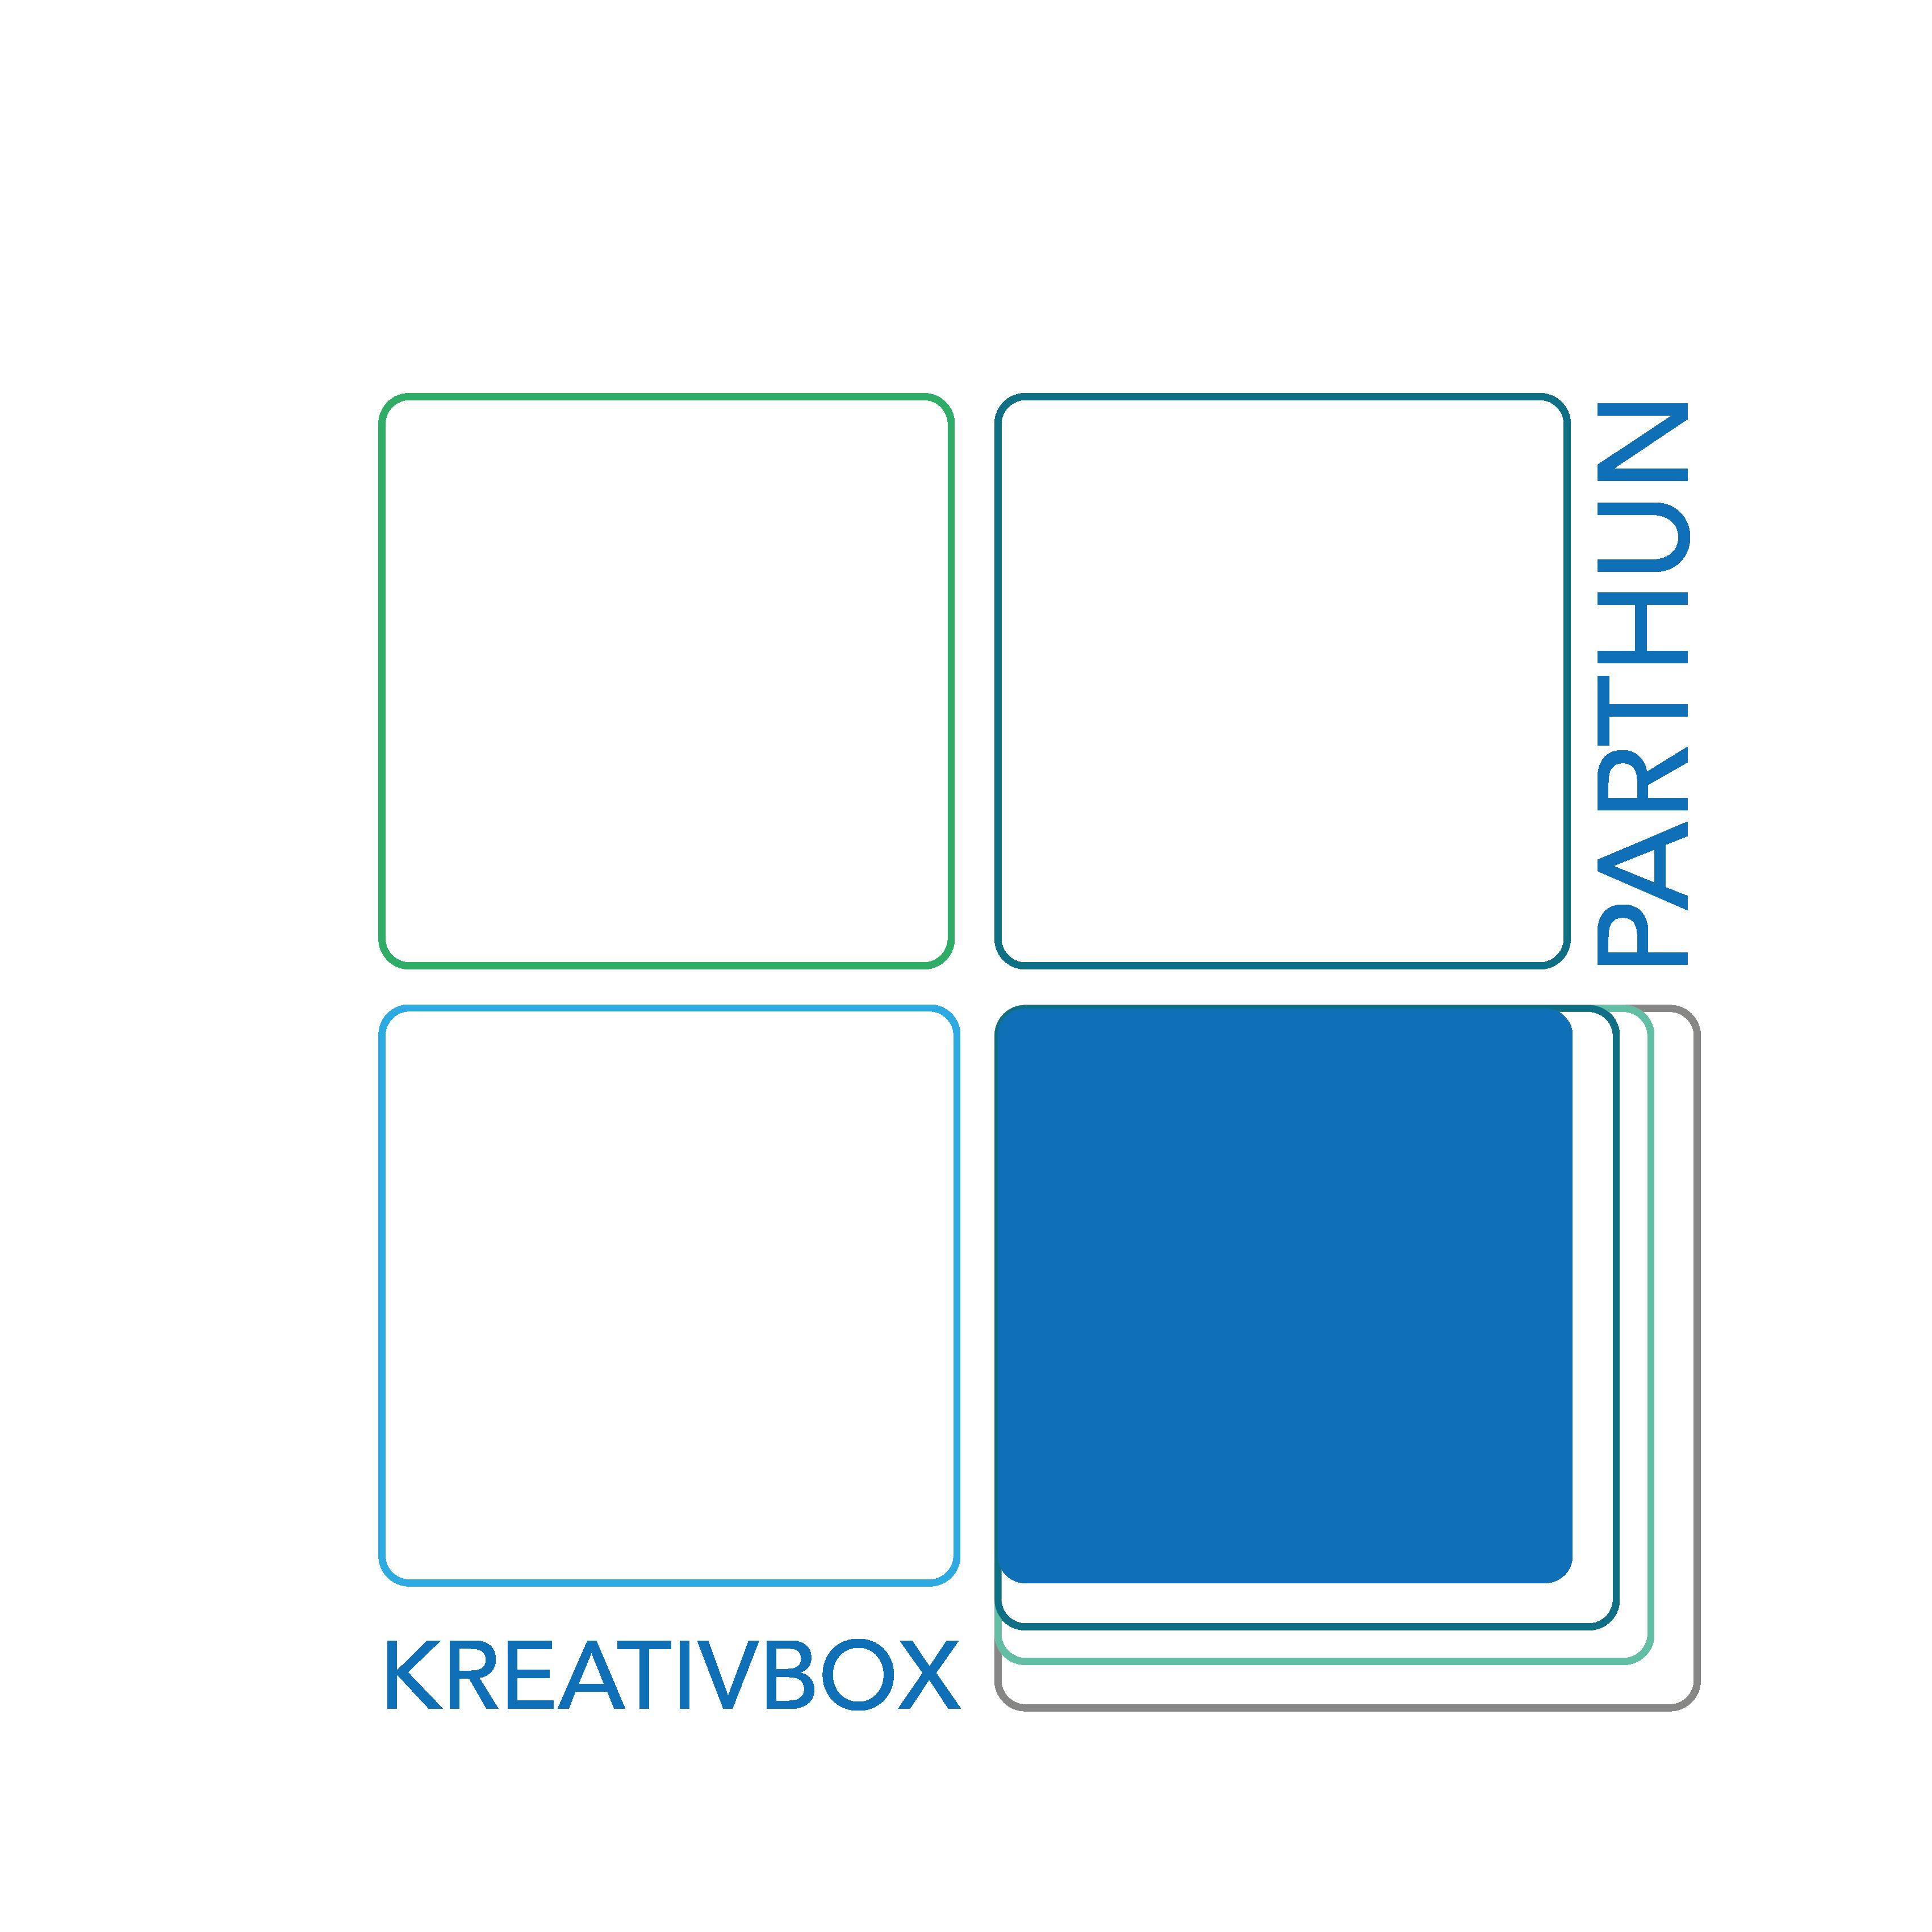 KREATIVBOX PARTHUN